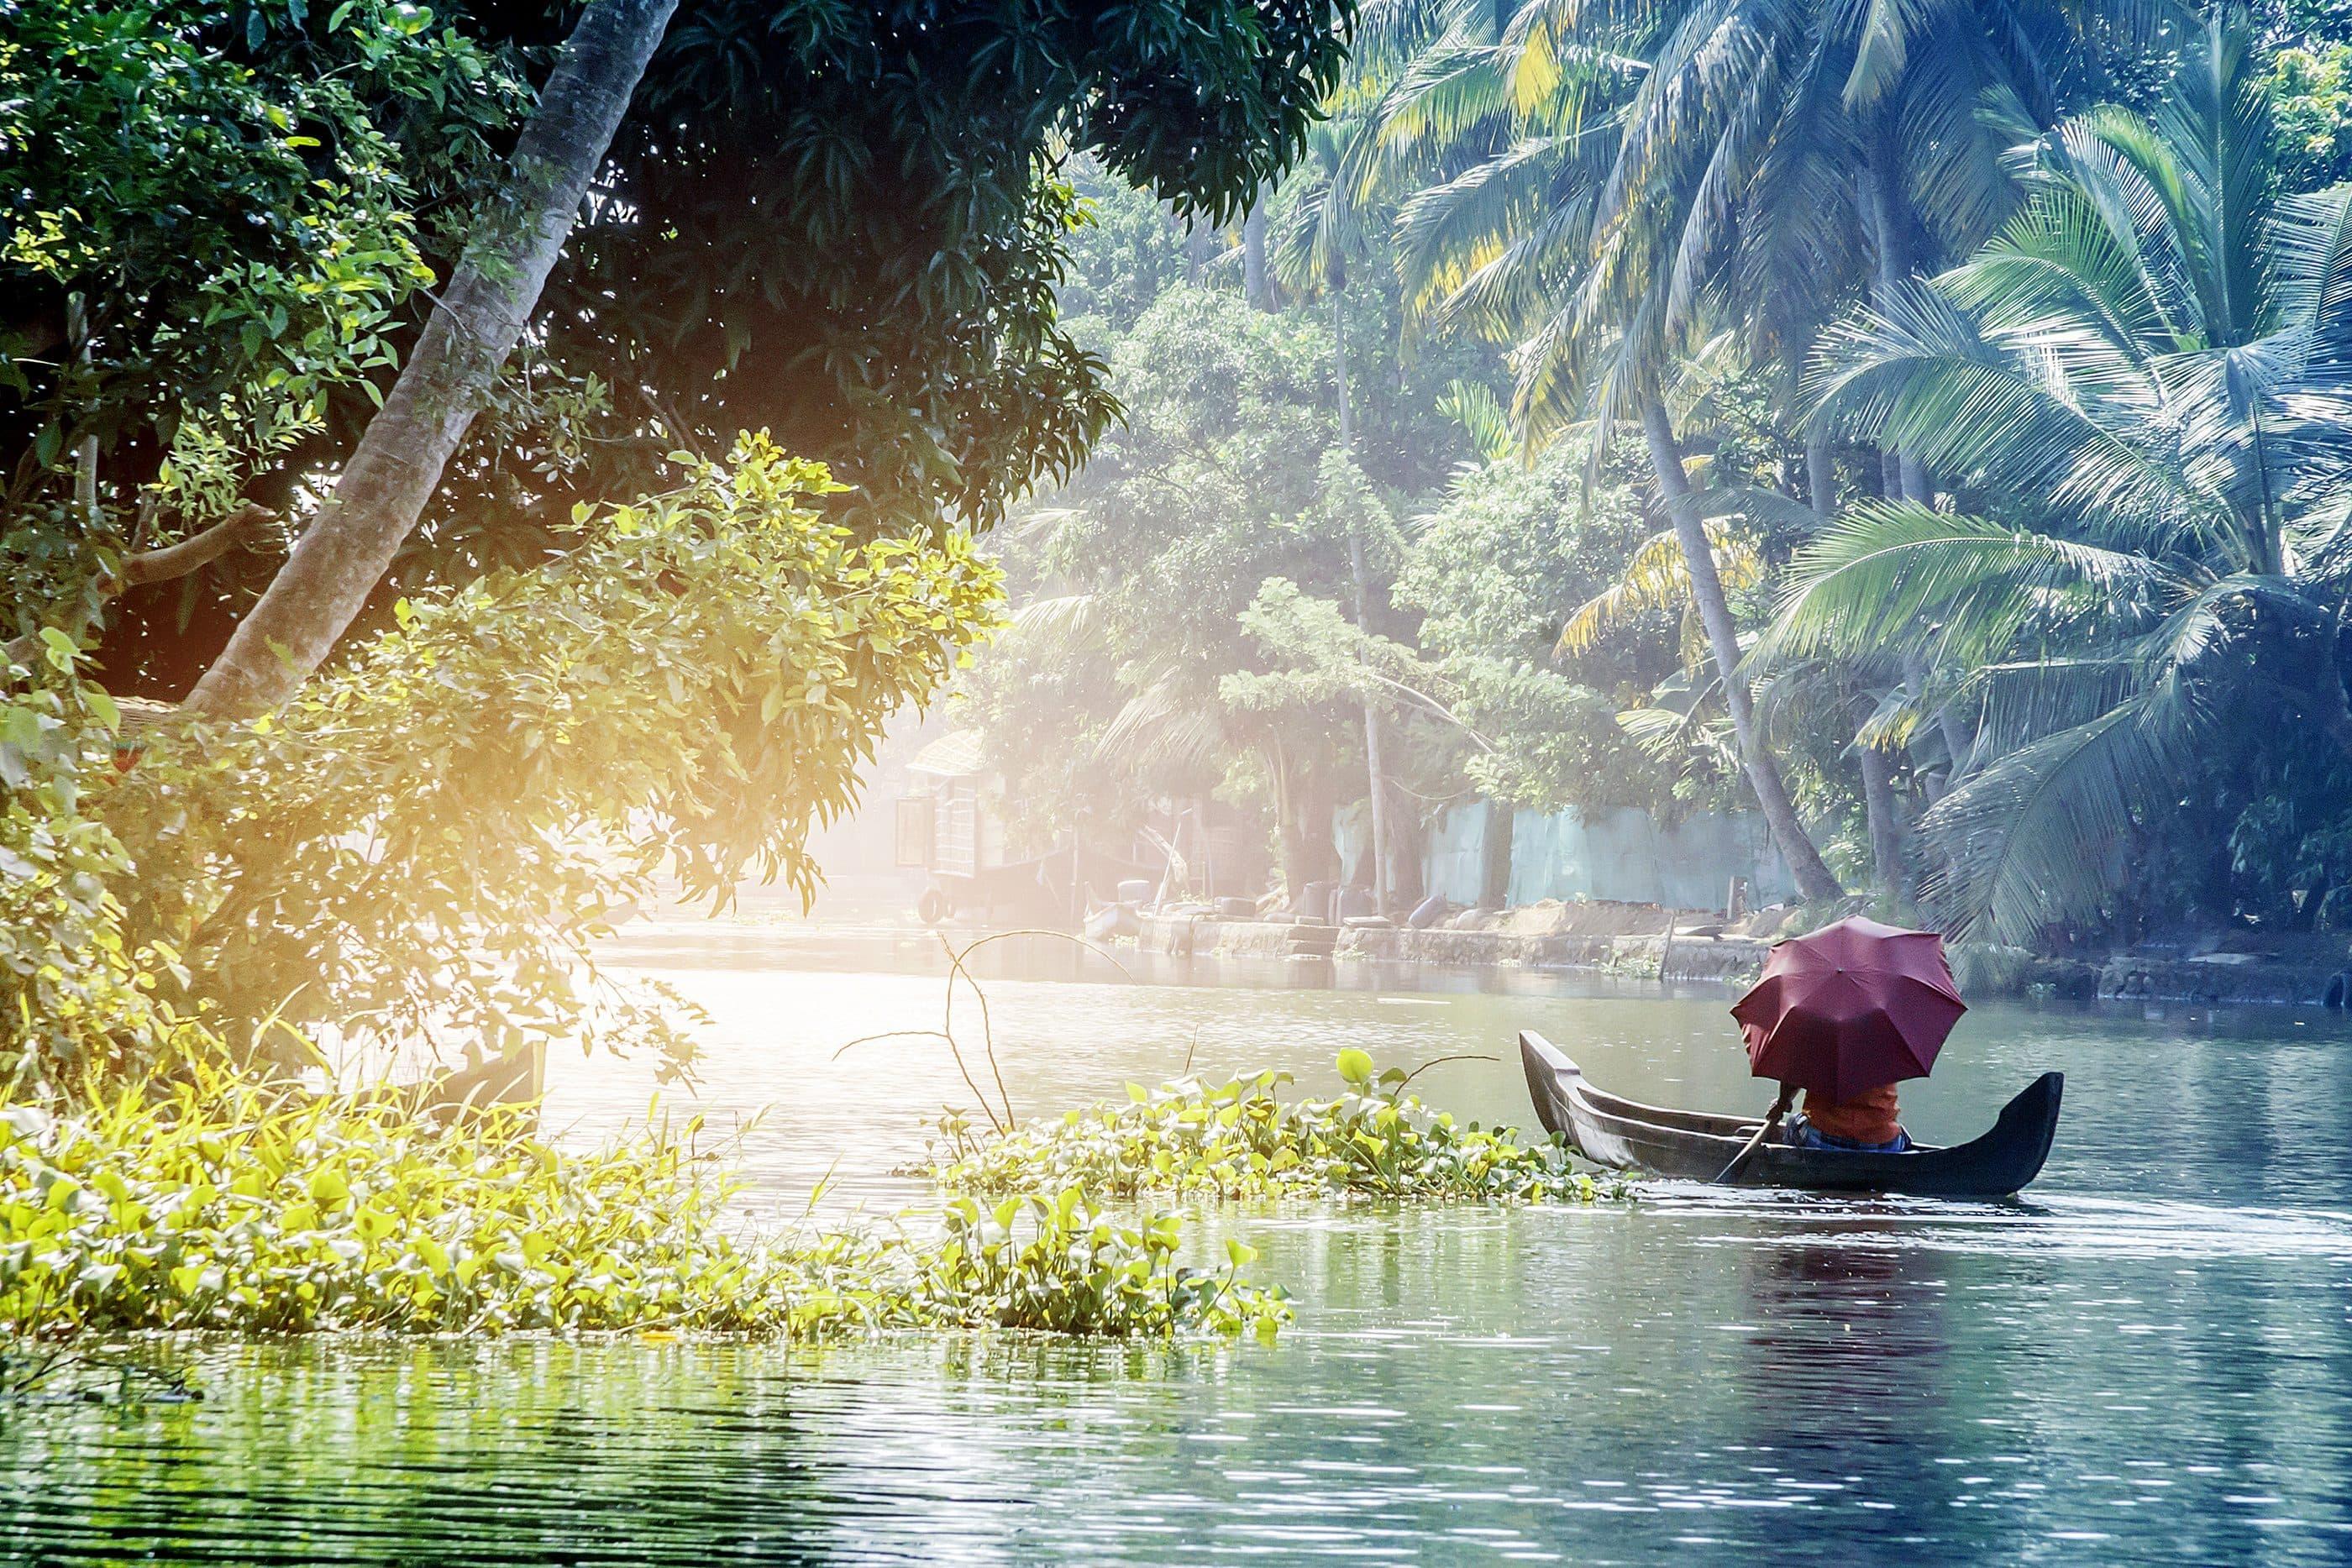 Boat travels down Kerala waterway